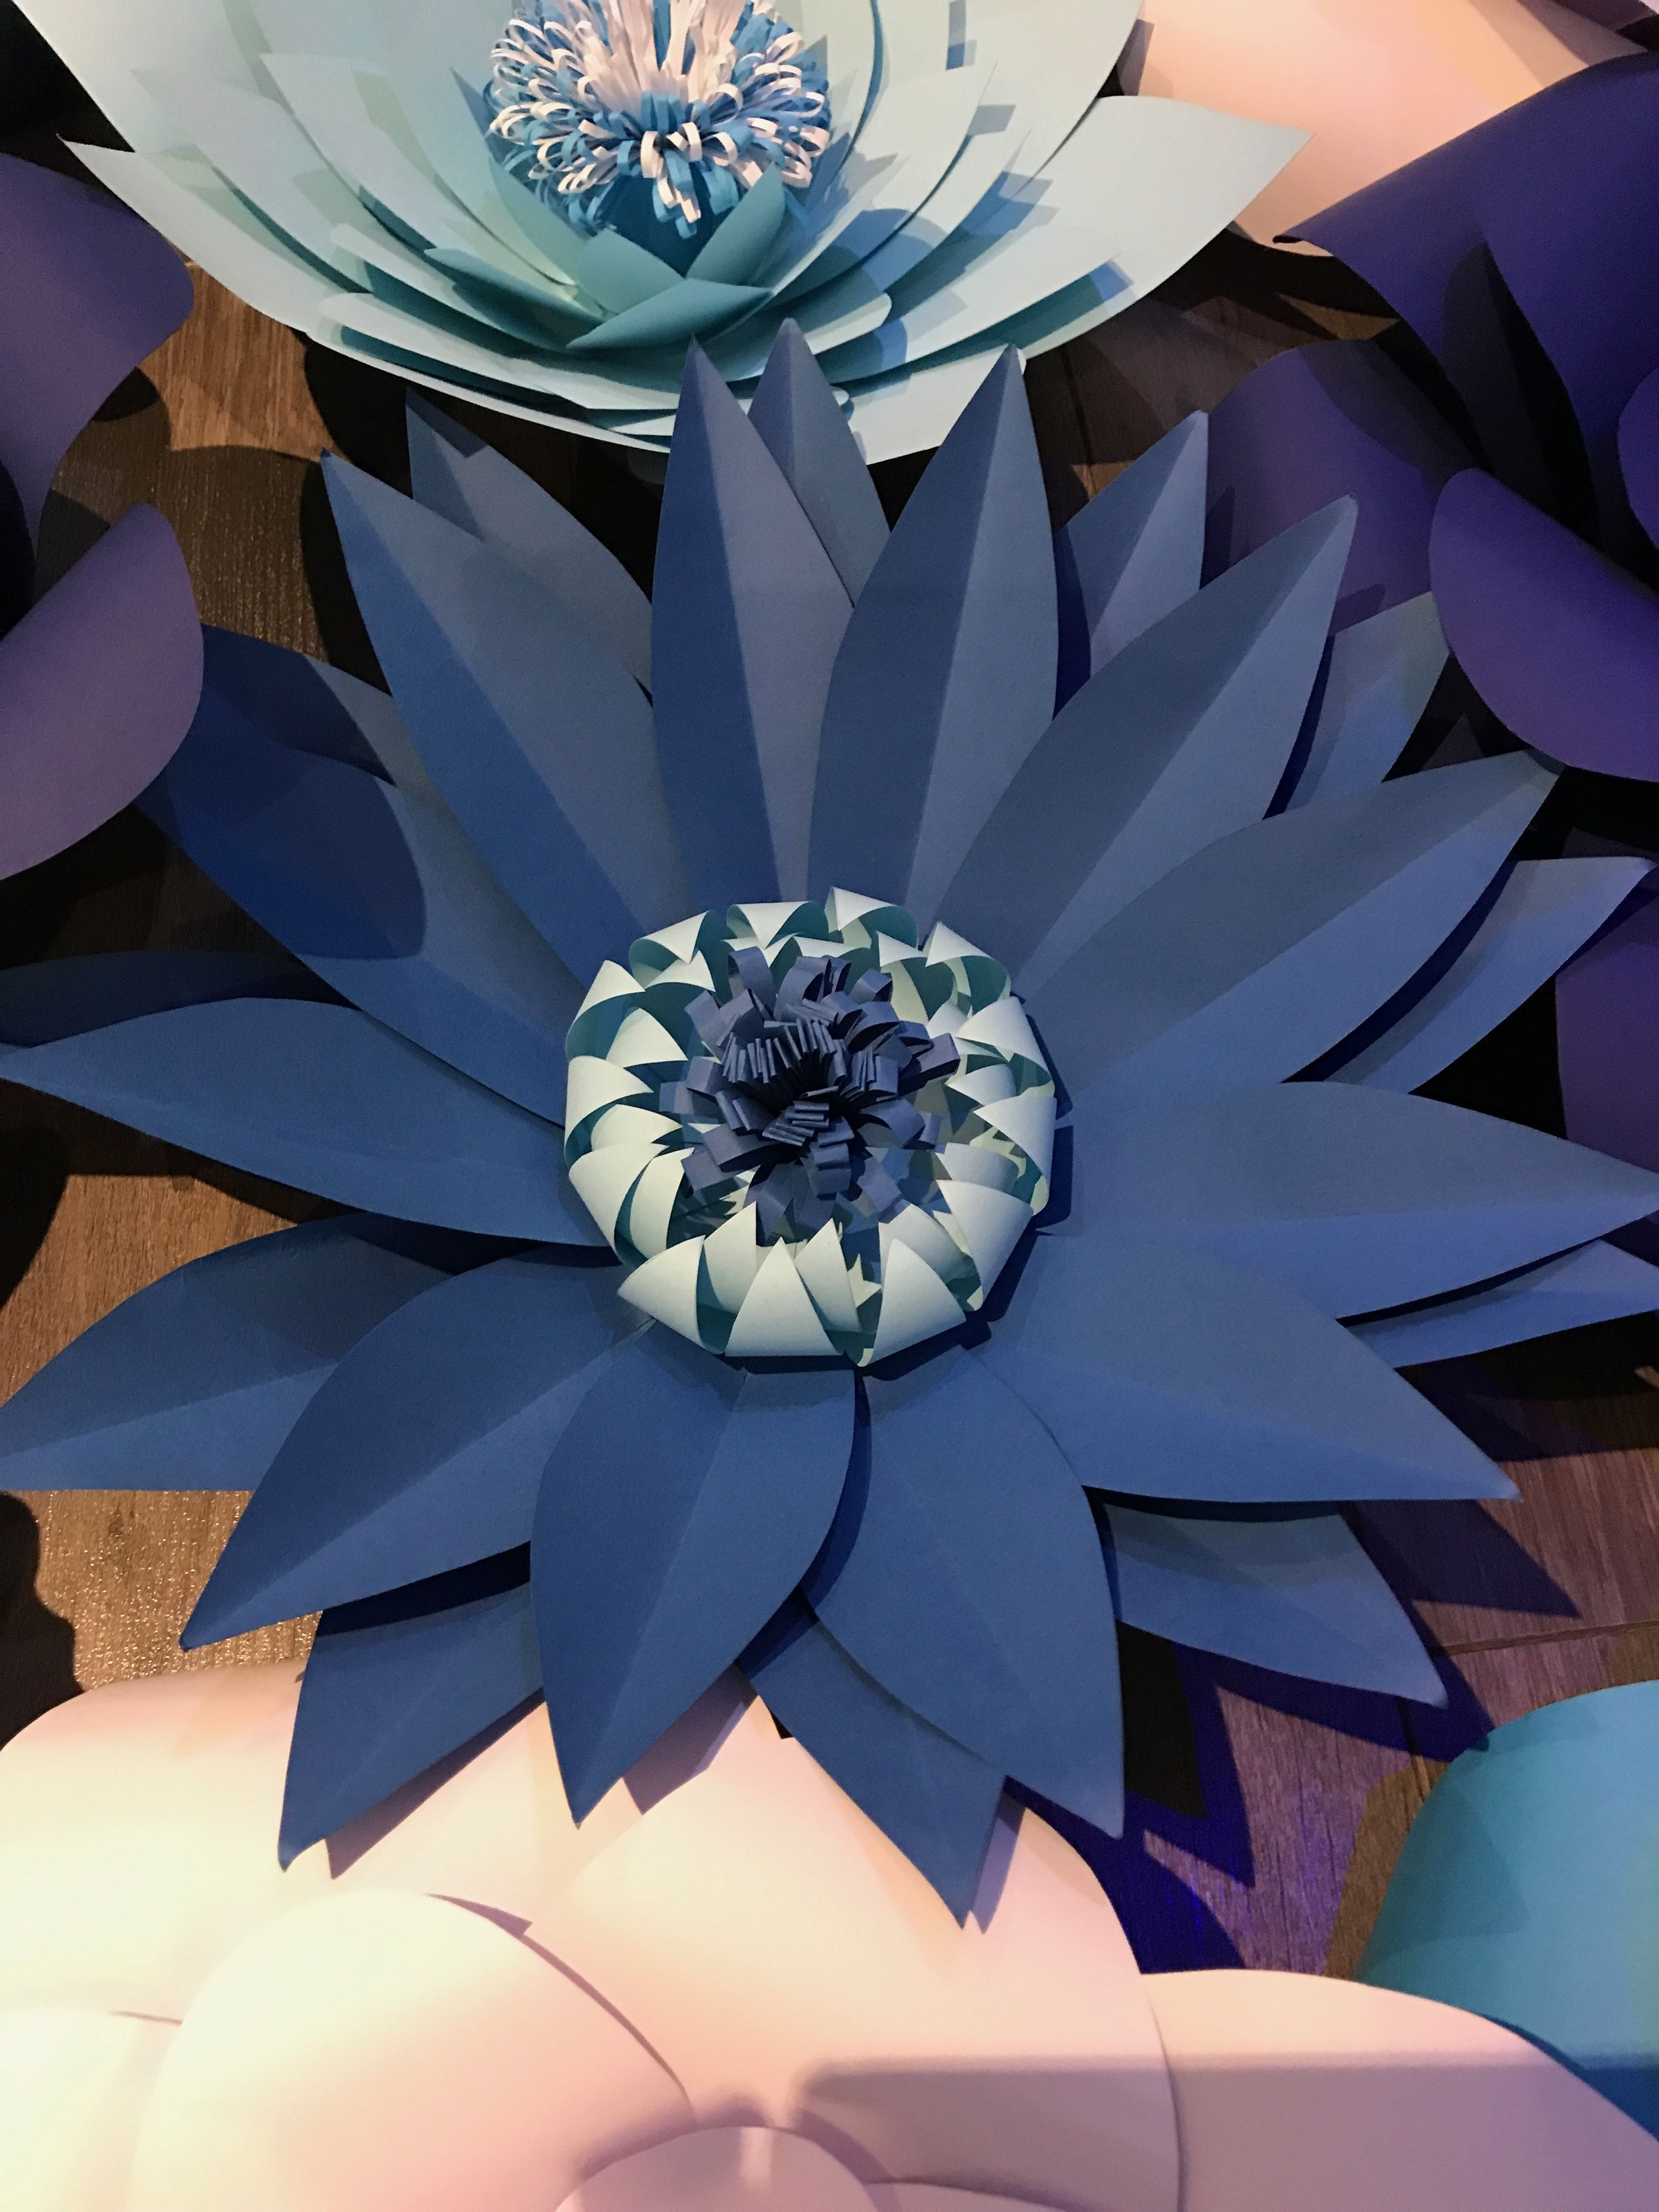 Pin By Poonehdehghani On Paper Flowers Pinterest Flowers Diy